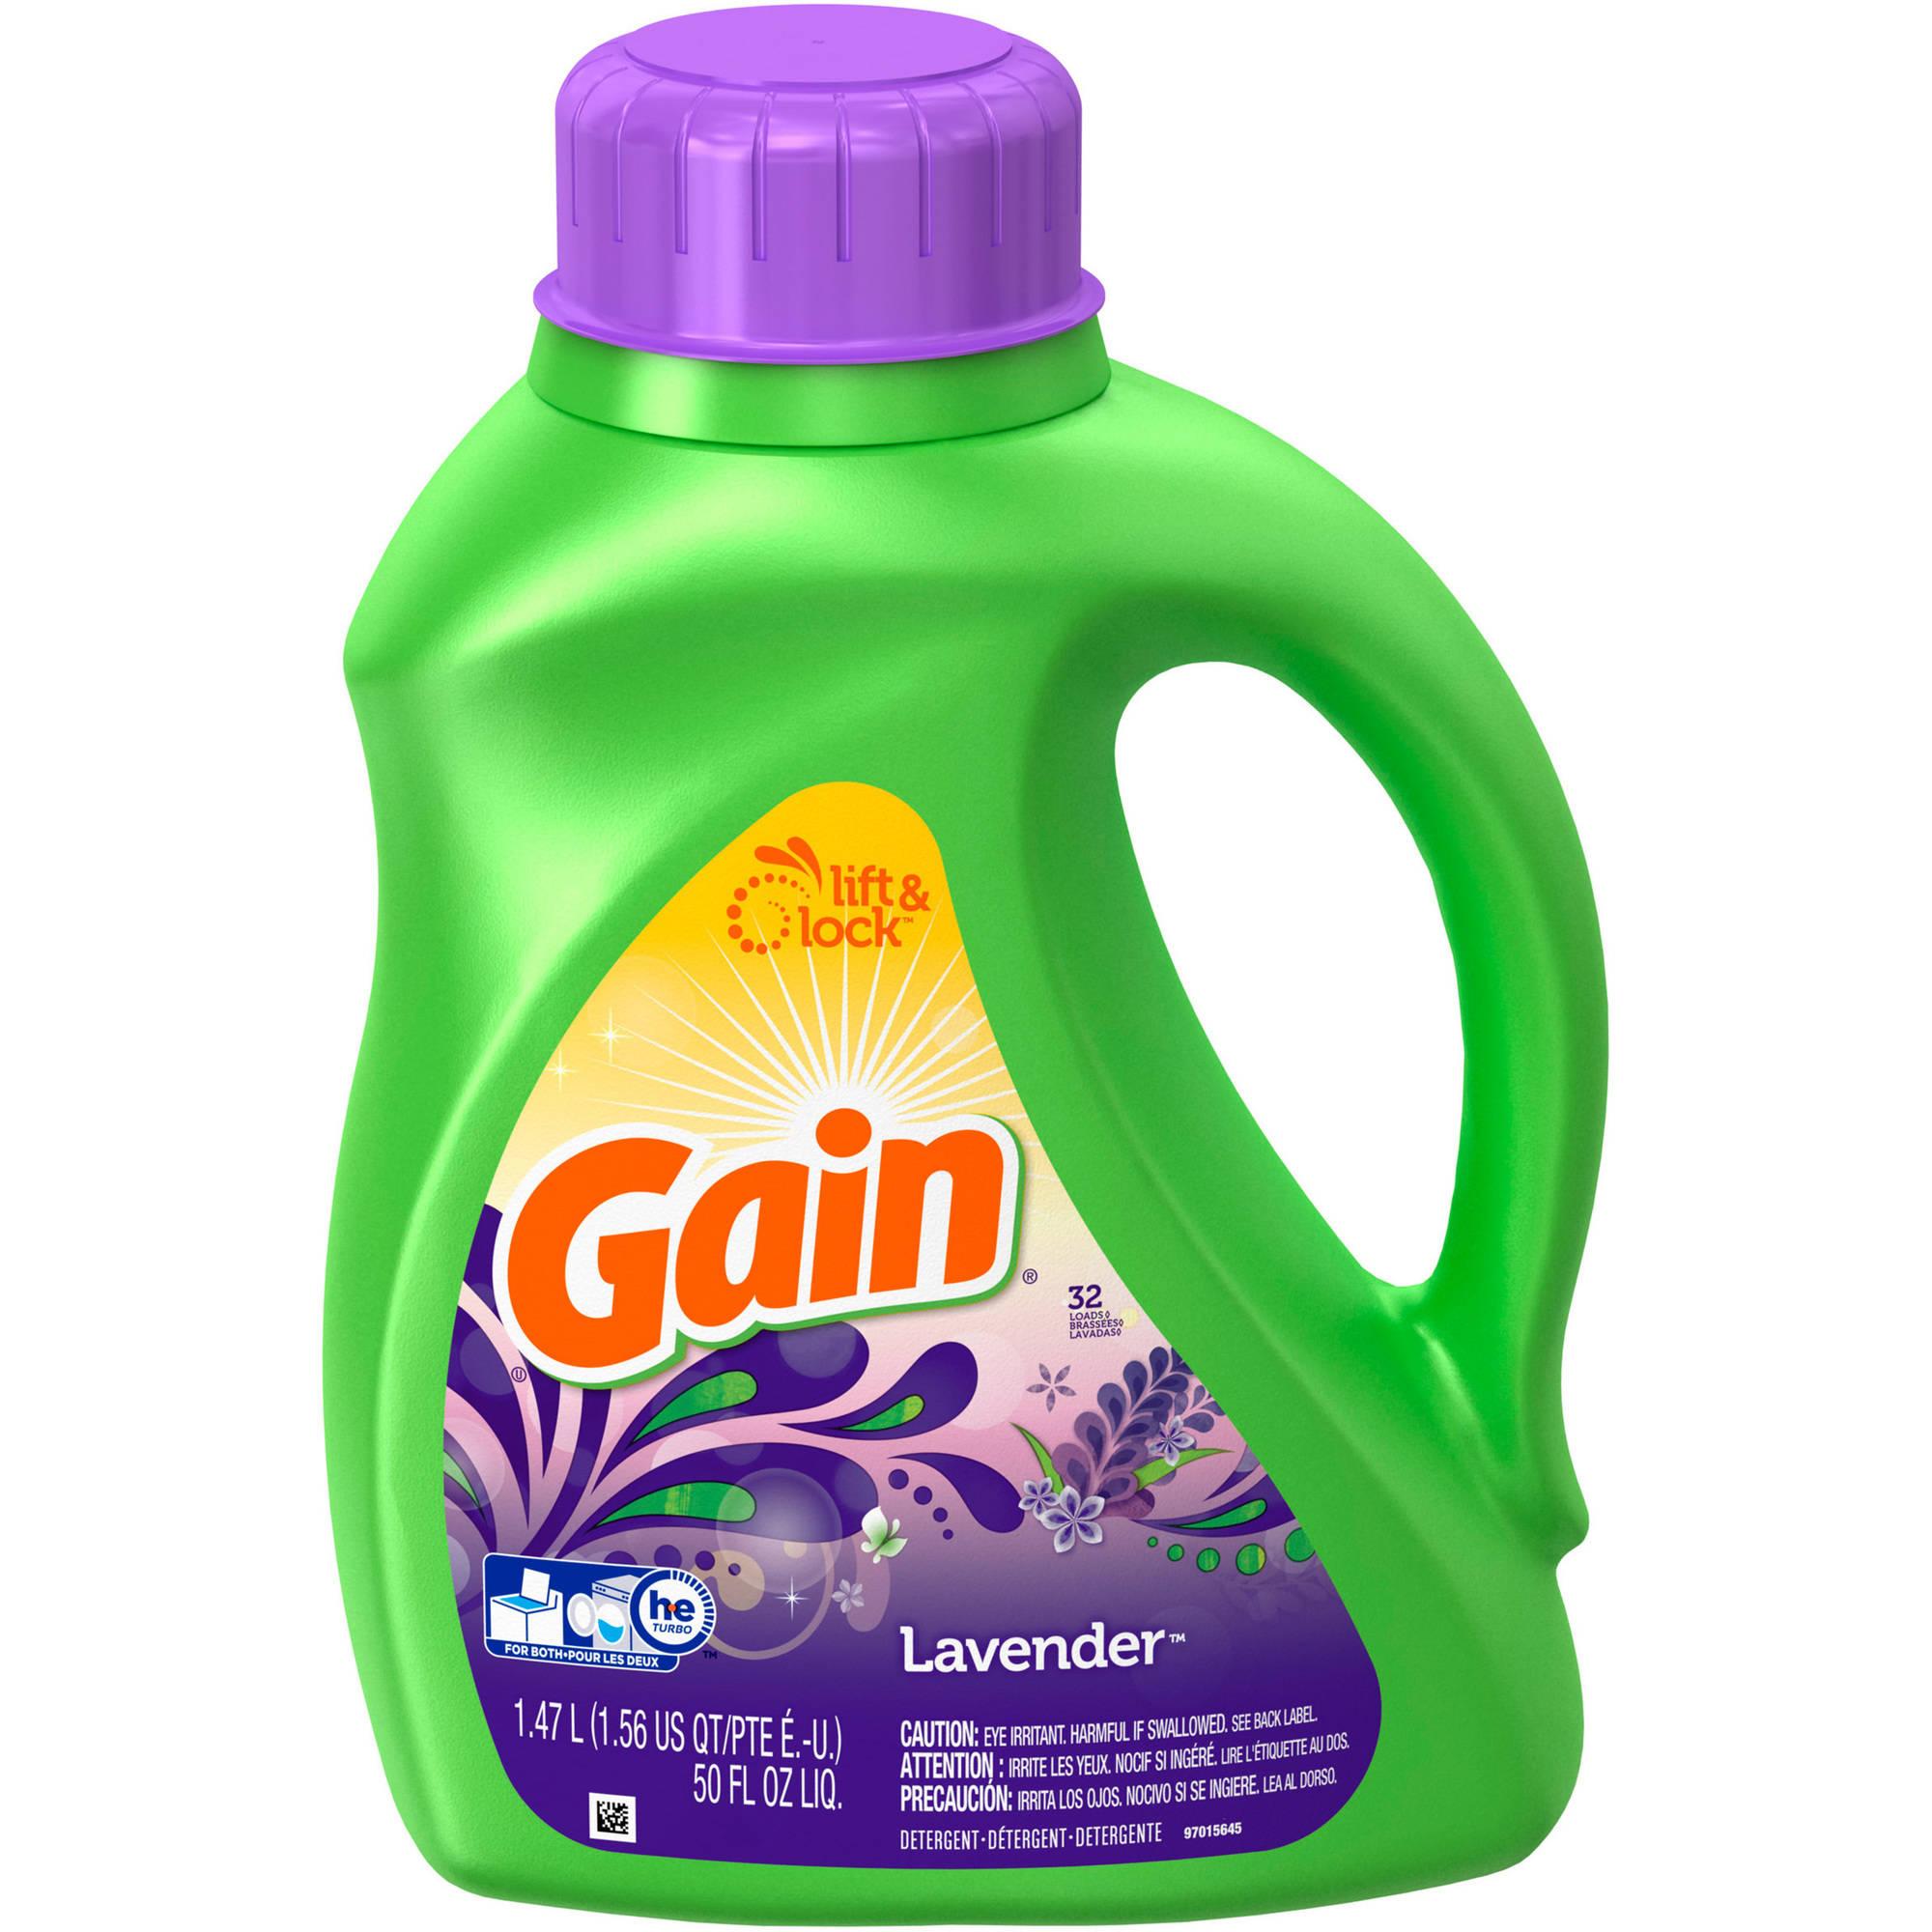 Gain Liquid Laundry Detergent, Lavender Scent, 32 loads, 50 fl oz